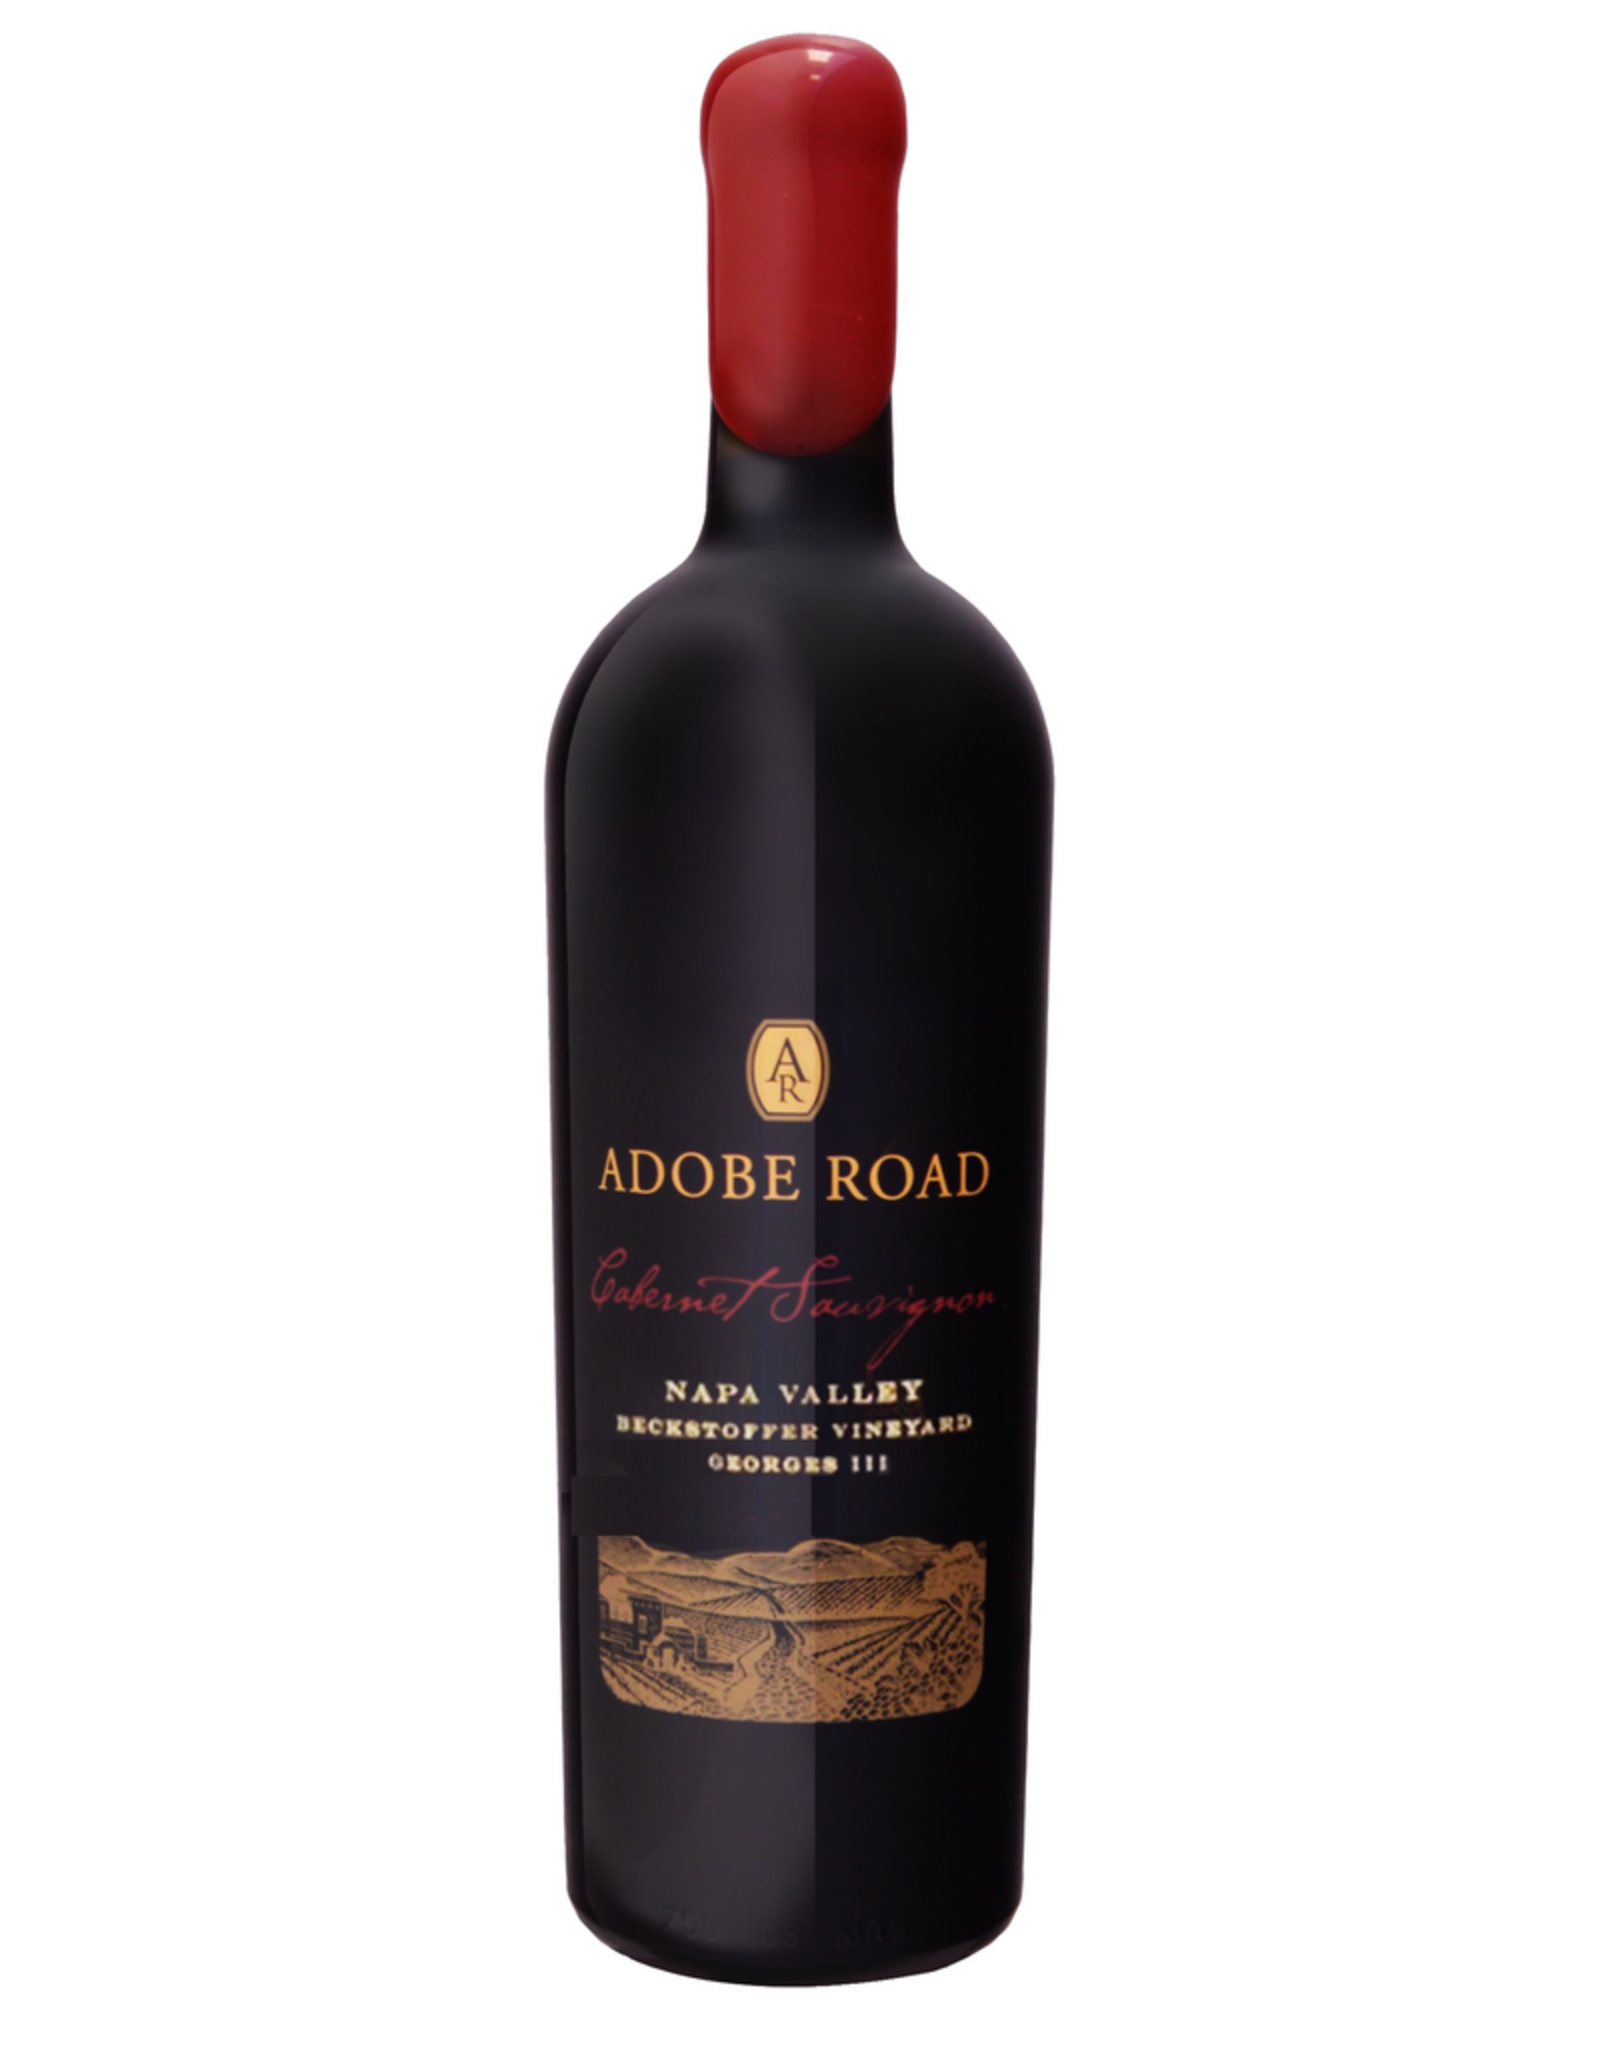 Red Wine 2014, Adobe Road Beckstoffer Georges III Vineyard, Cabernet Sauvignon, Napa, California, USA, 14.8% Alc